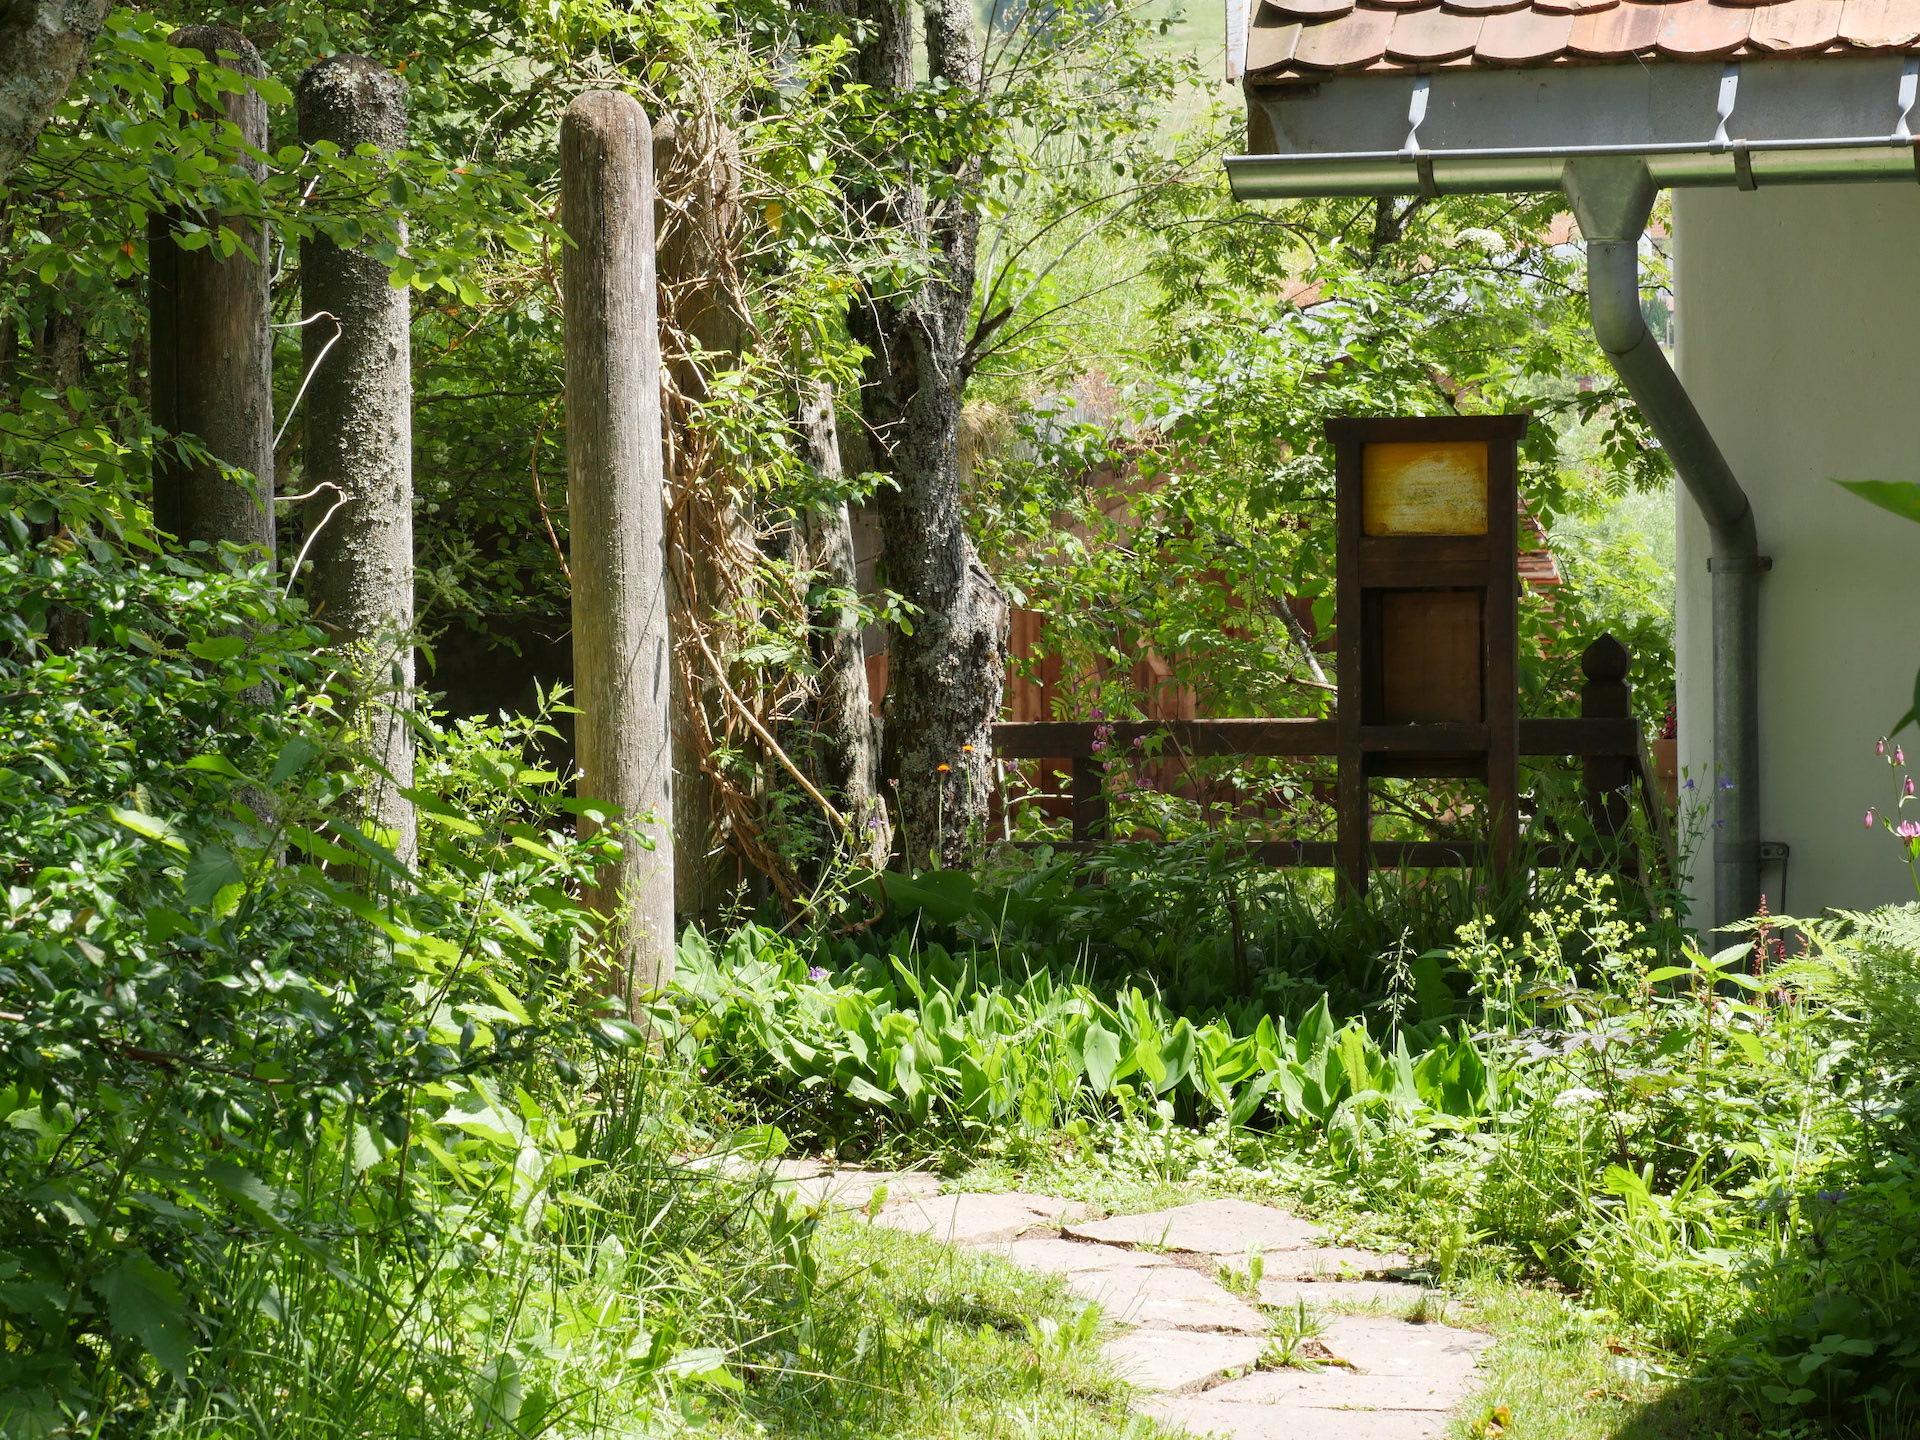 schwarzwald hotzenhaus sommer johanneshof zen meditation zazen buddhismus